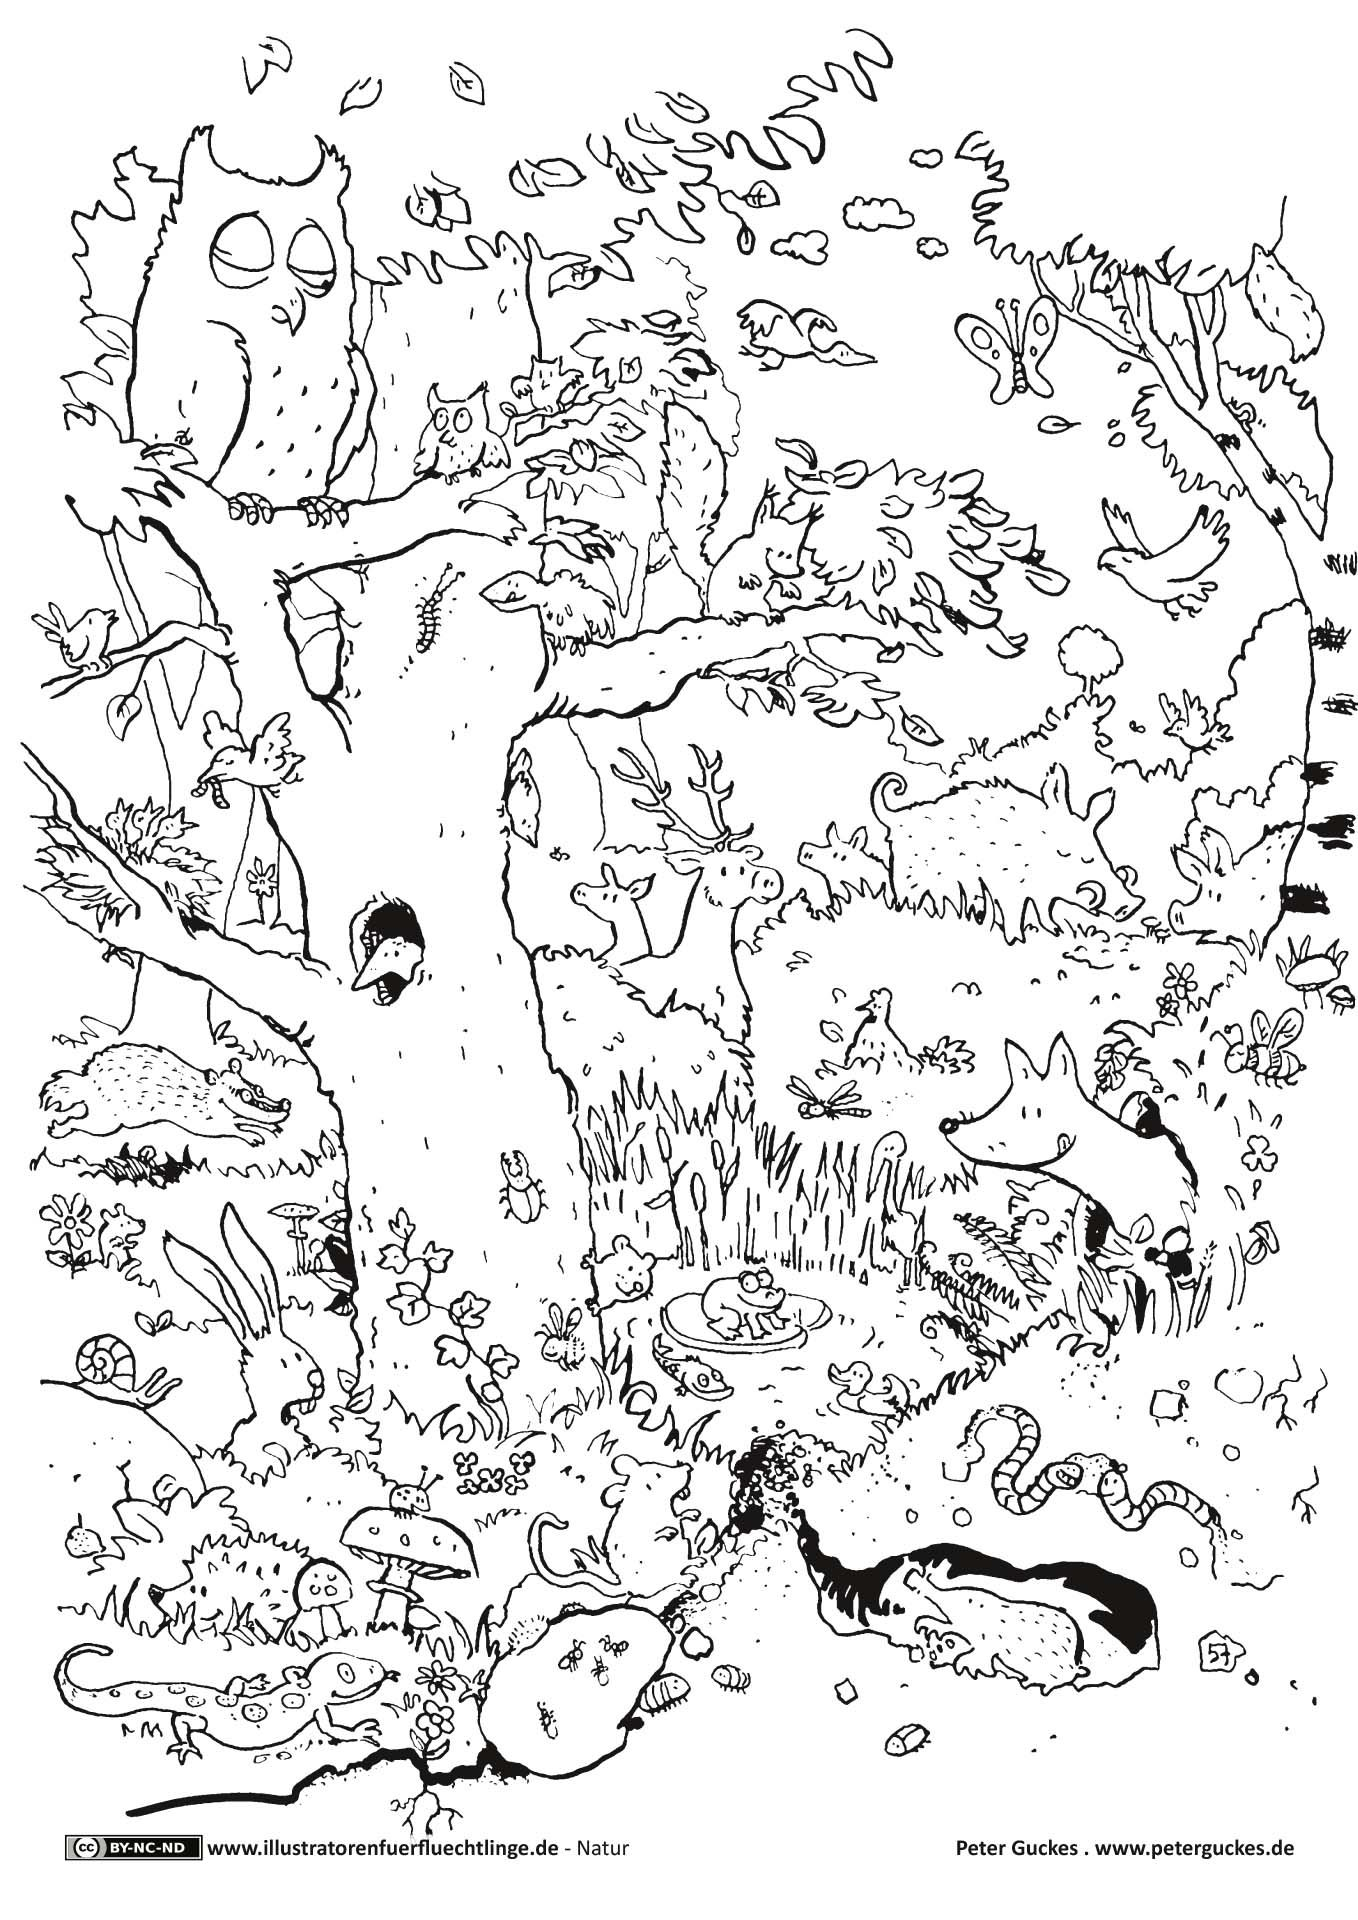 Download als PDF: Natur – Wald Tiere